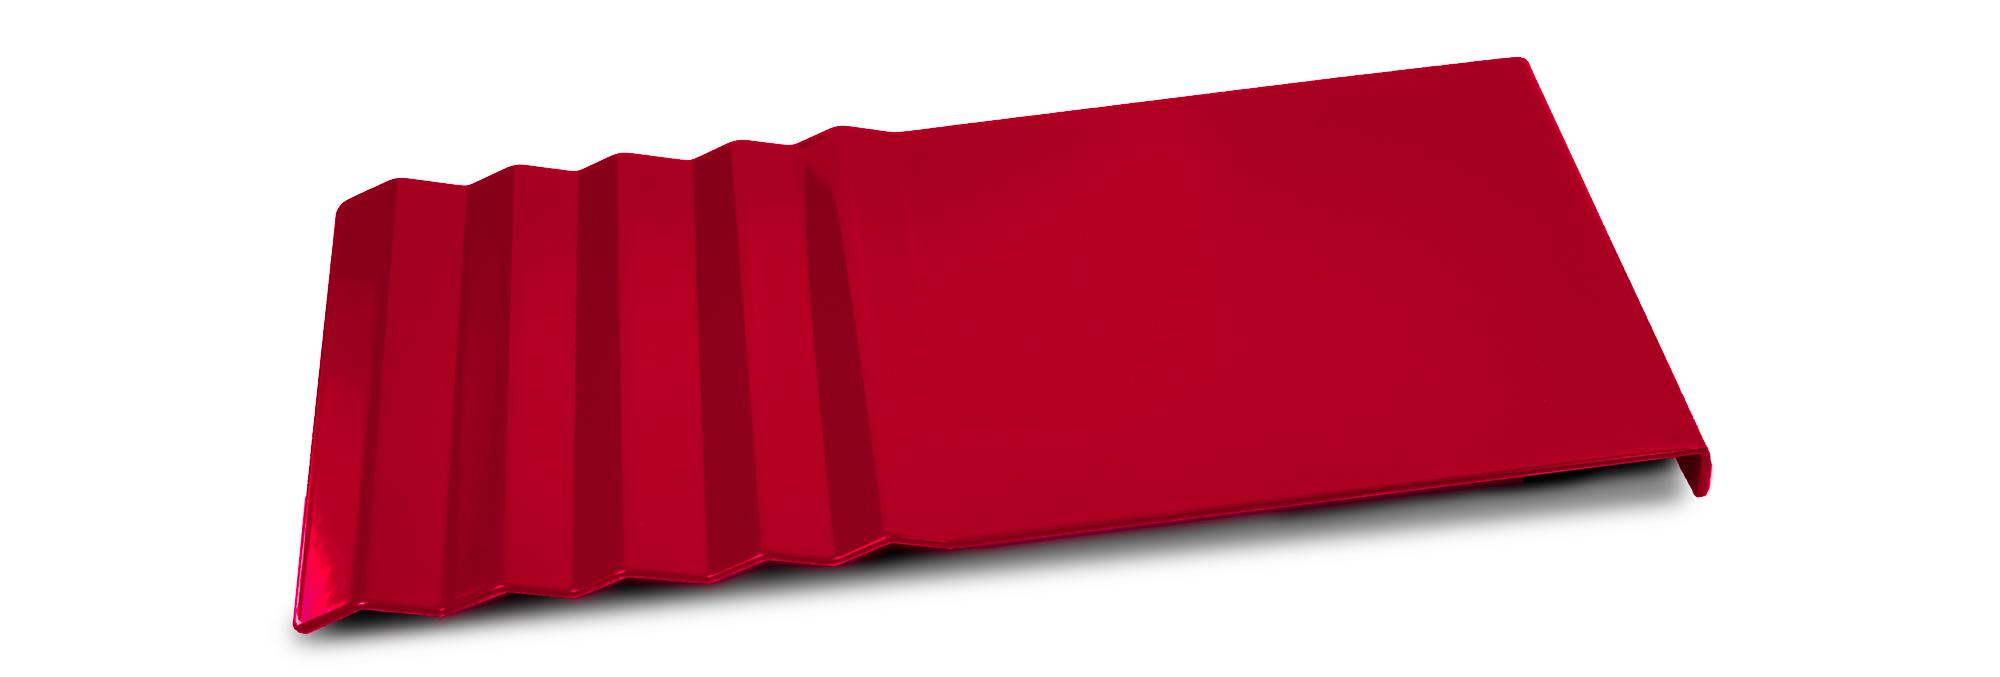 Stanford Cardinal Red